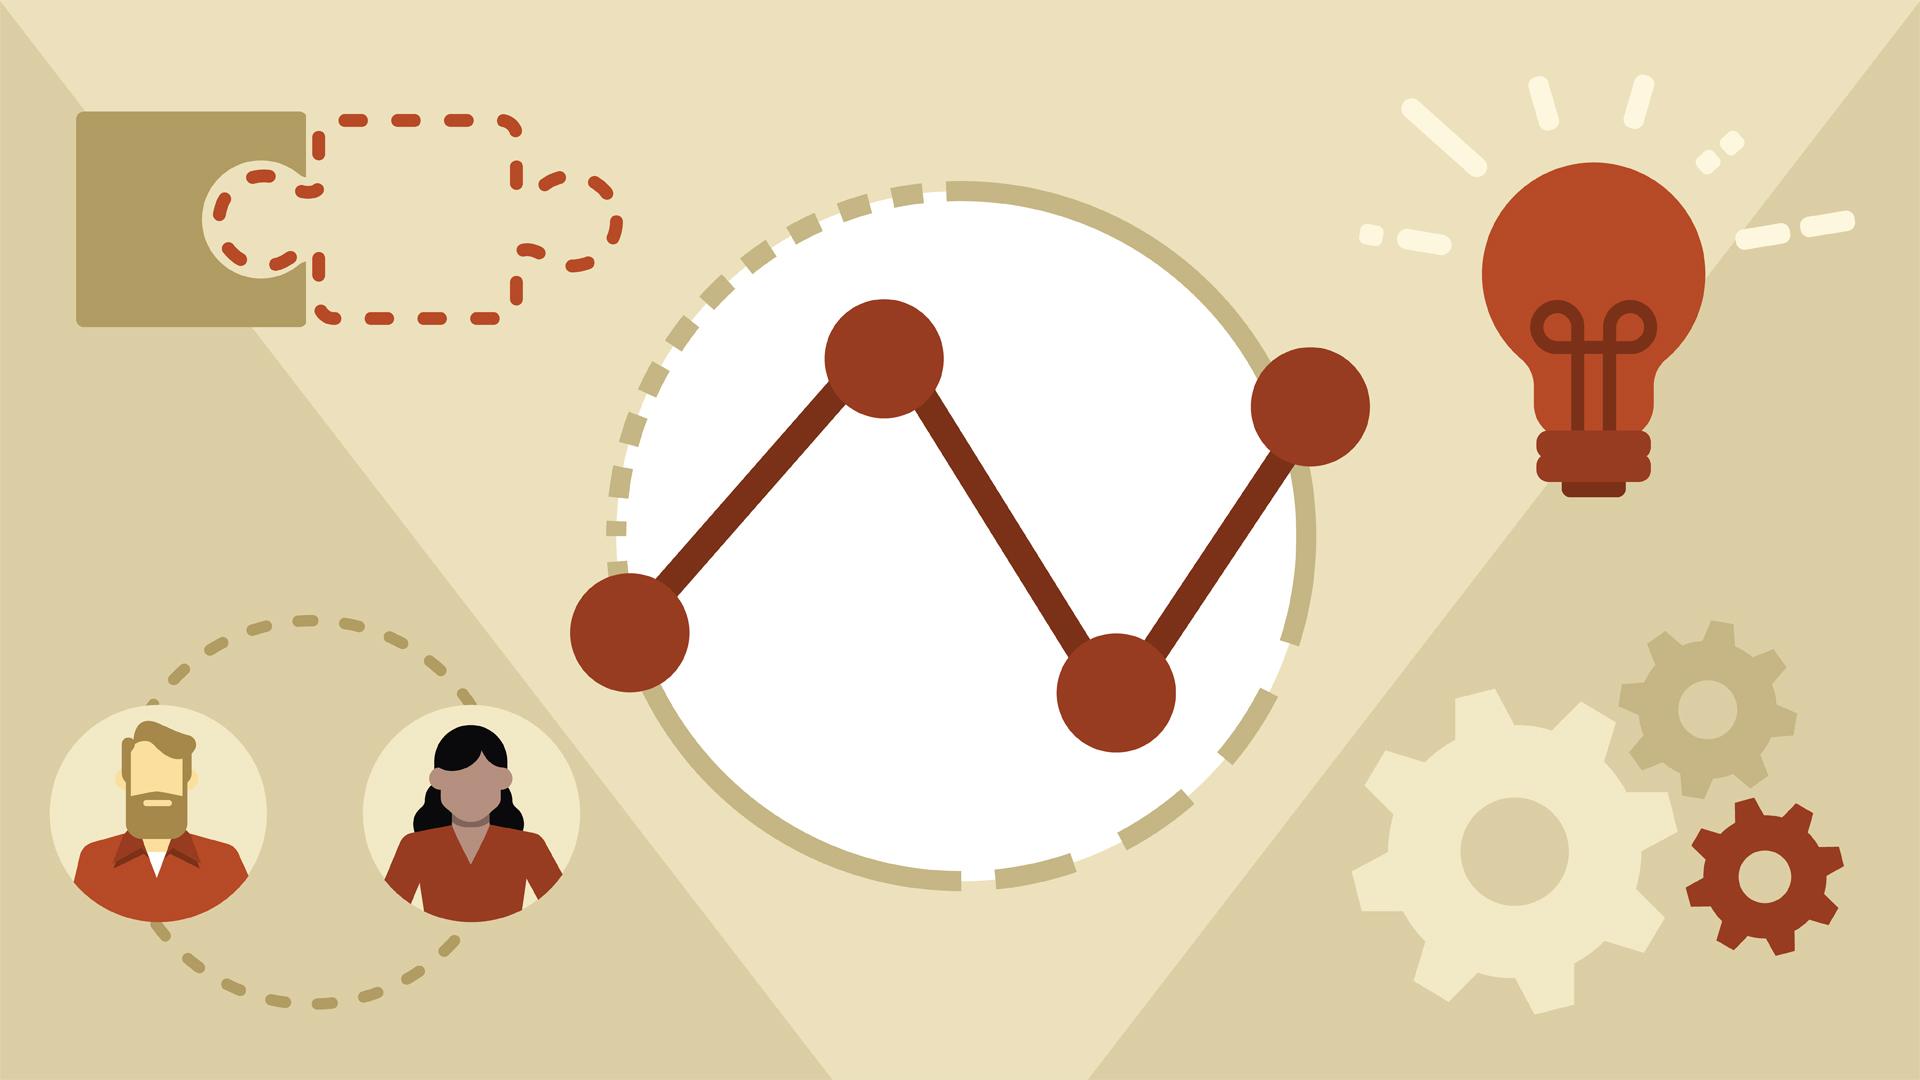 Design Thinking: Data Intelligence Online Class | LinkedIn Learning,  formerly Lynda.com